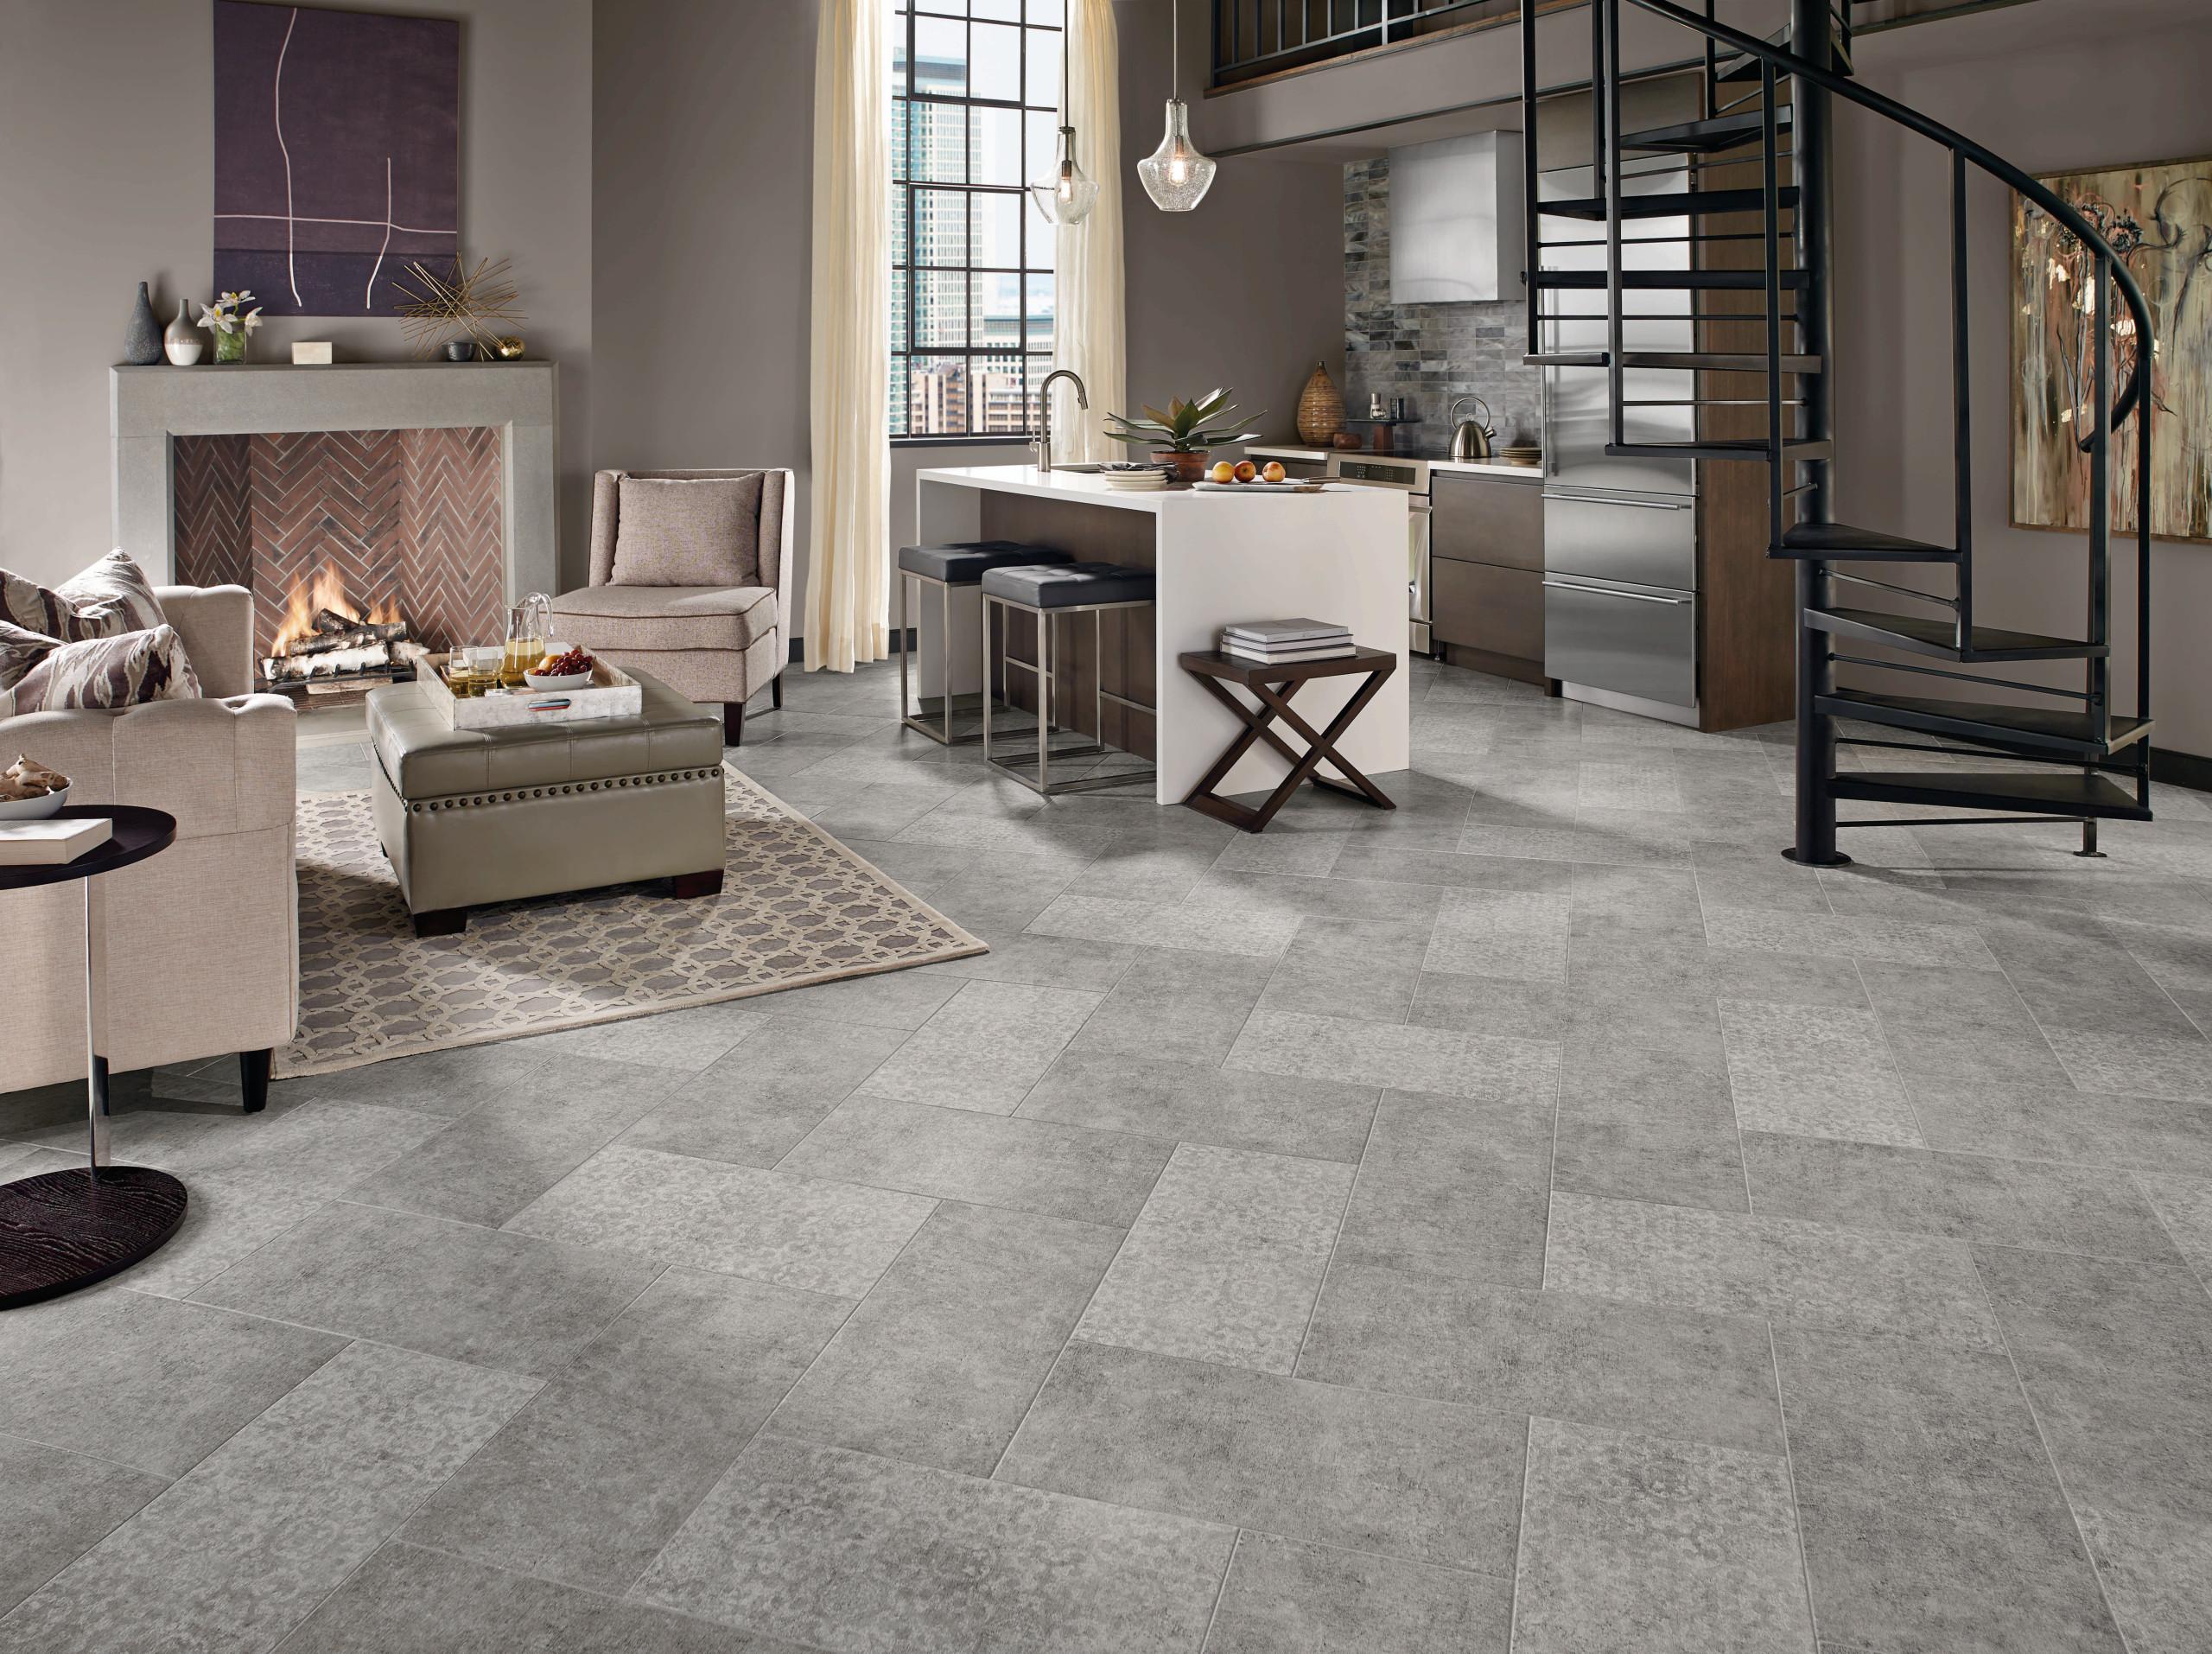 Gray Tile Living Room Ideas Photos Houzz